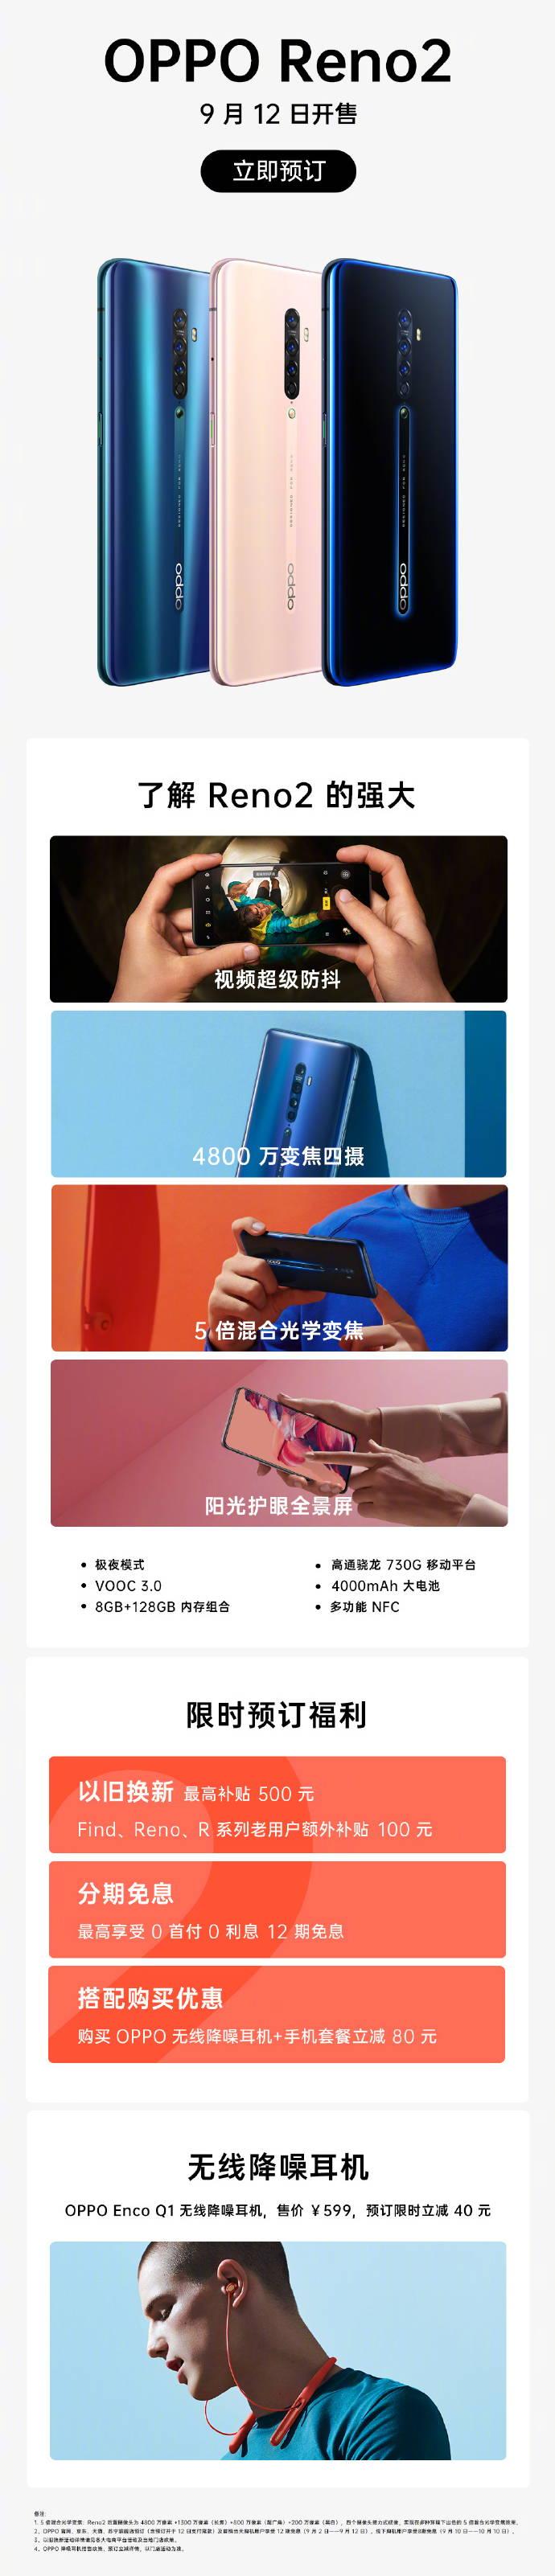 OPPO Reno 2将于9月10日发布:骁龙730G+升降前摄-玩懂手机网 - 玩懂手机第一手的手机资讯网(www.wdshouji.com)